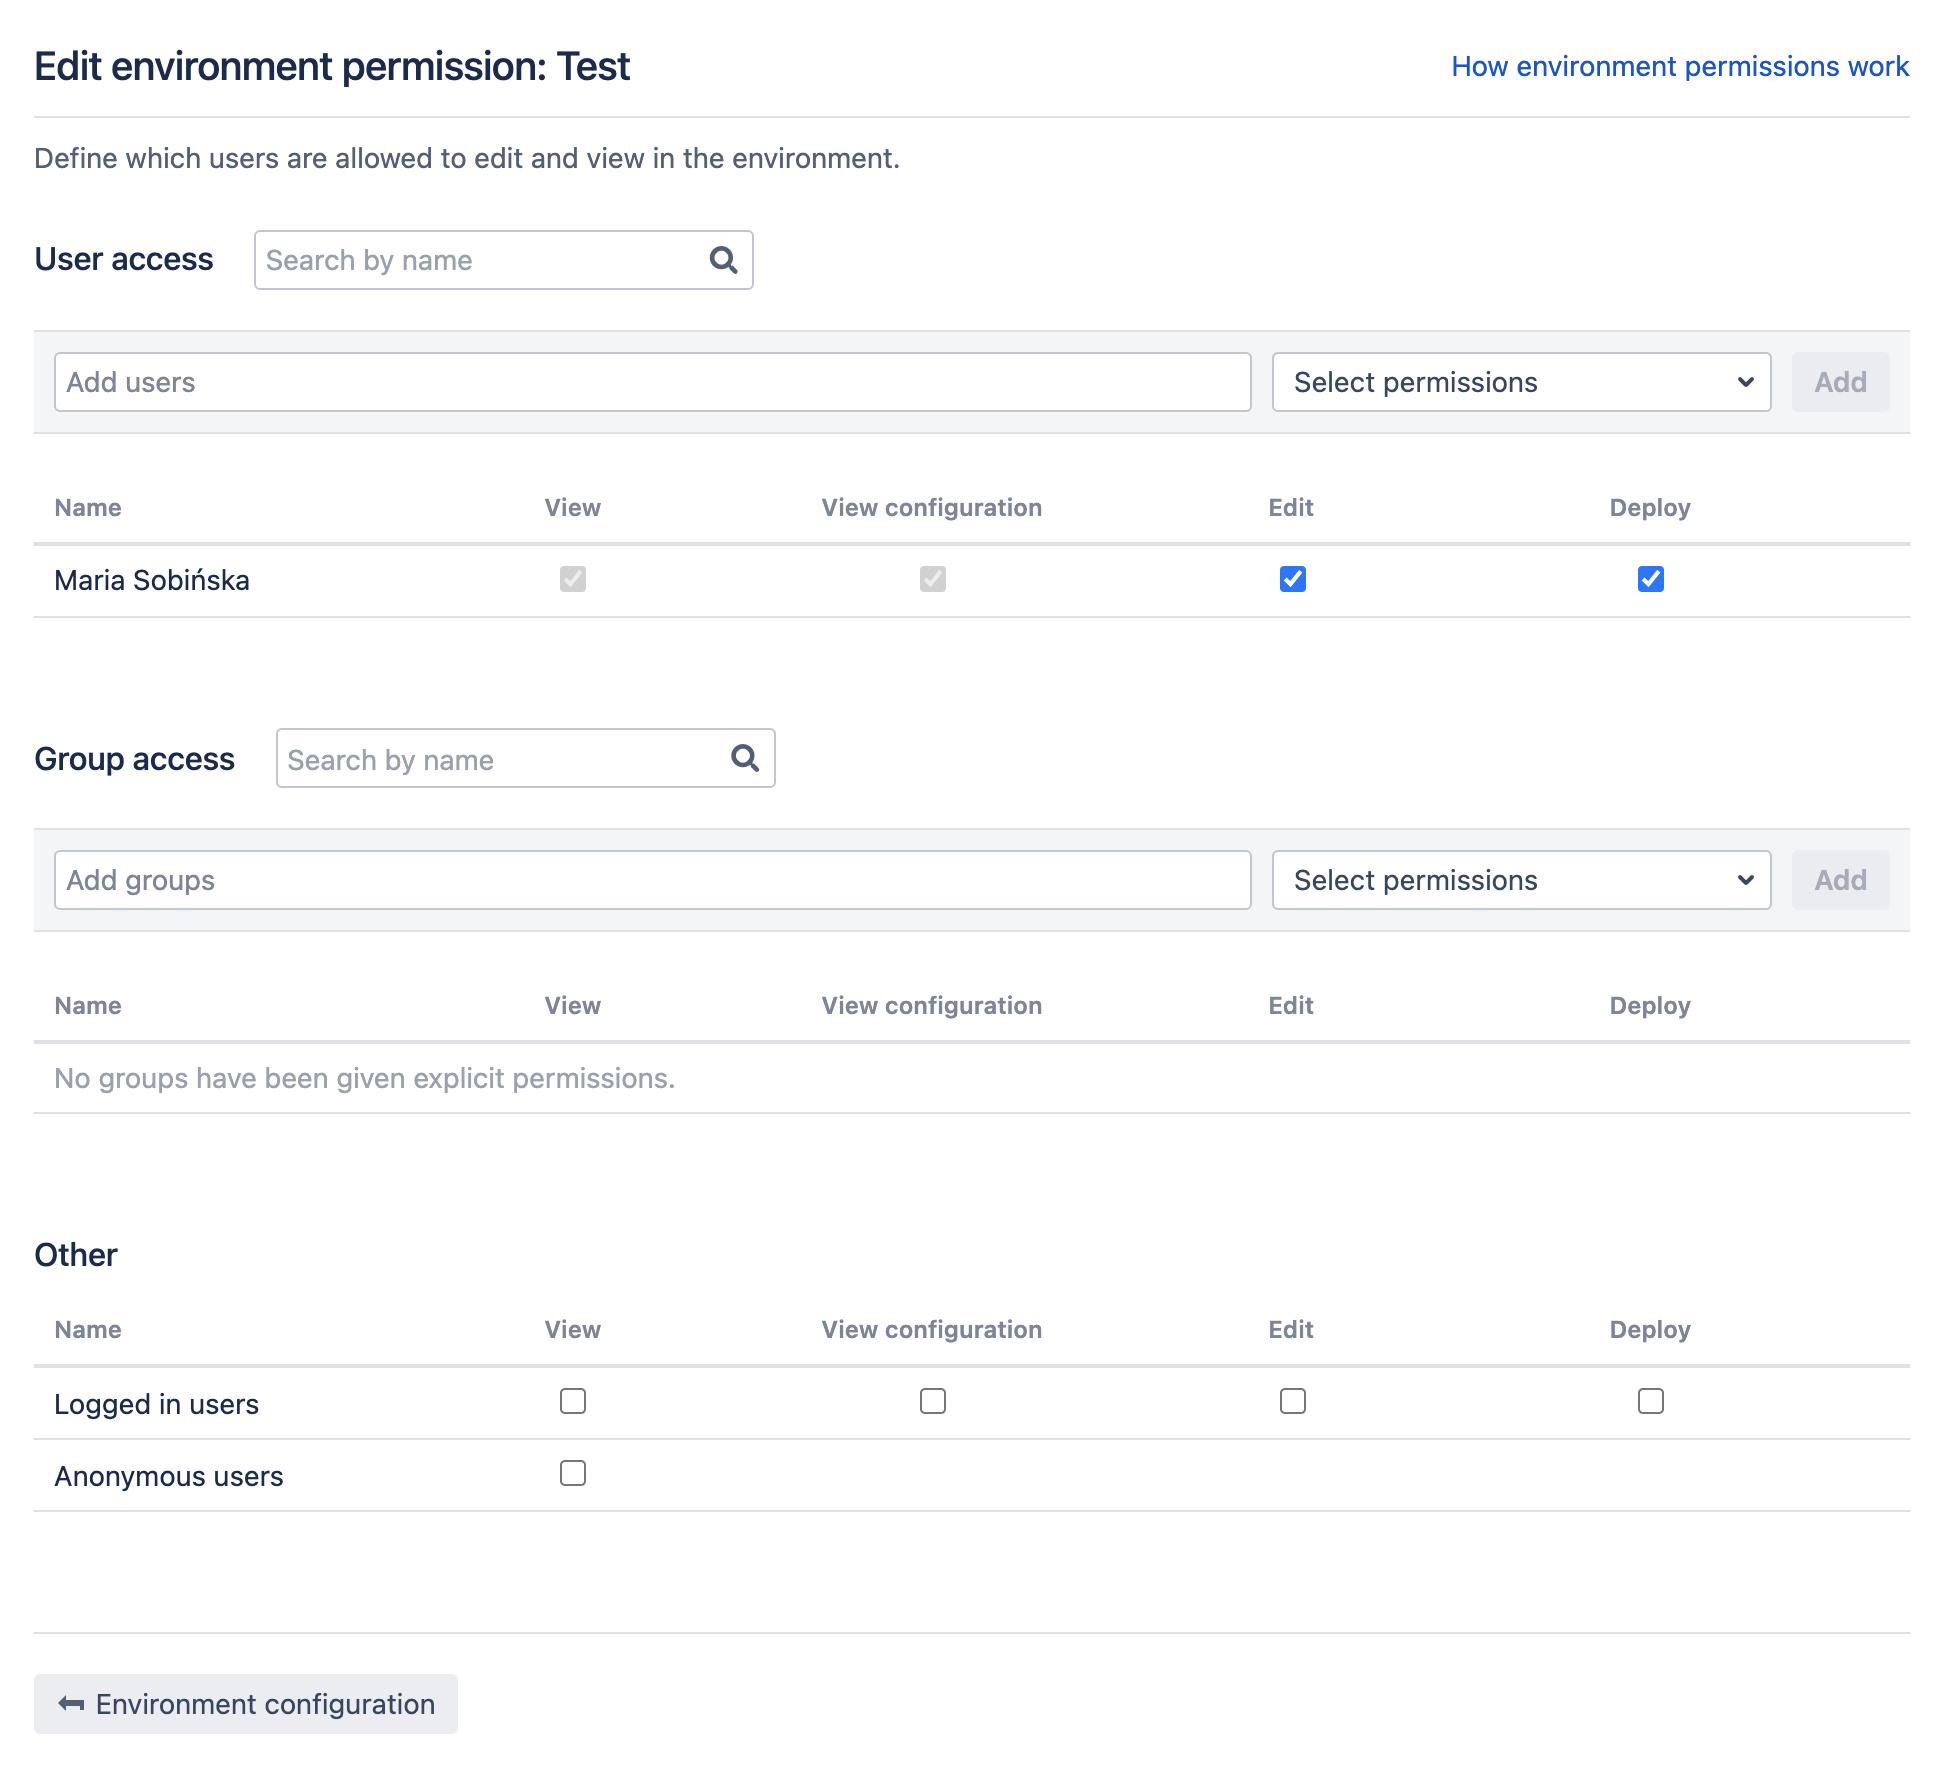 Edit environment permissions screen